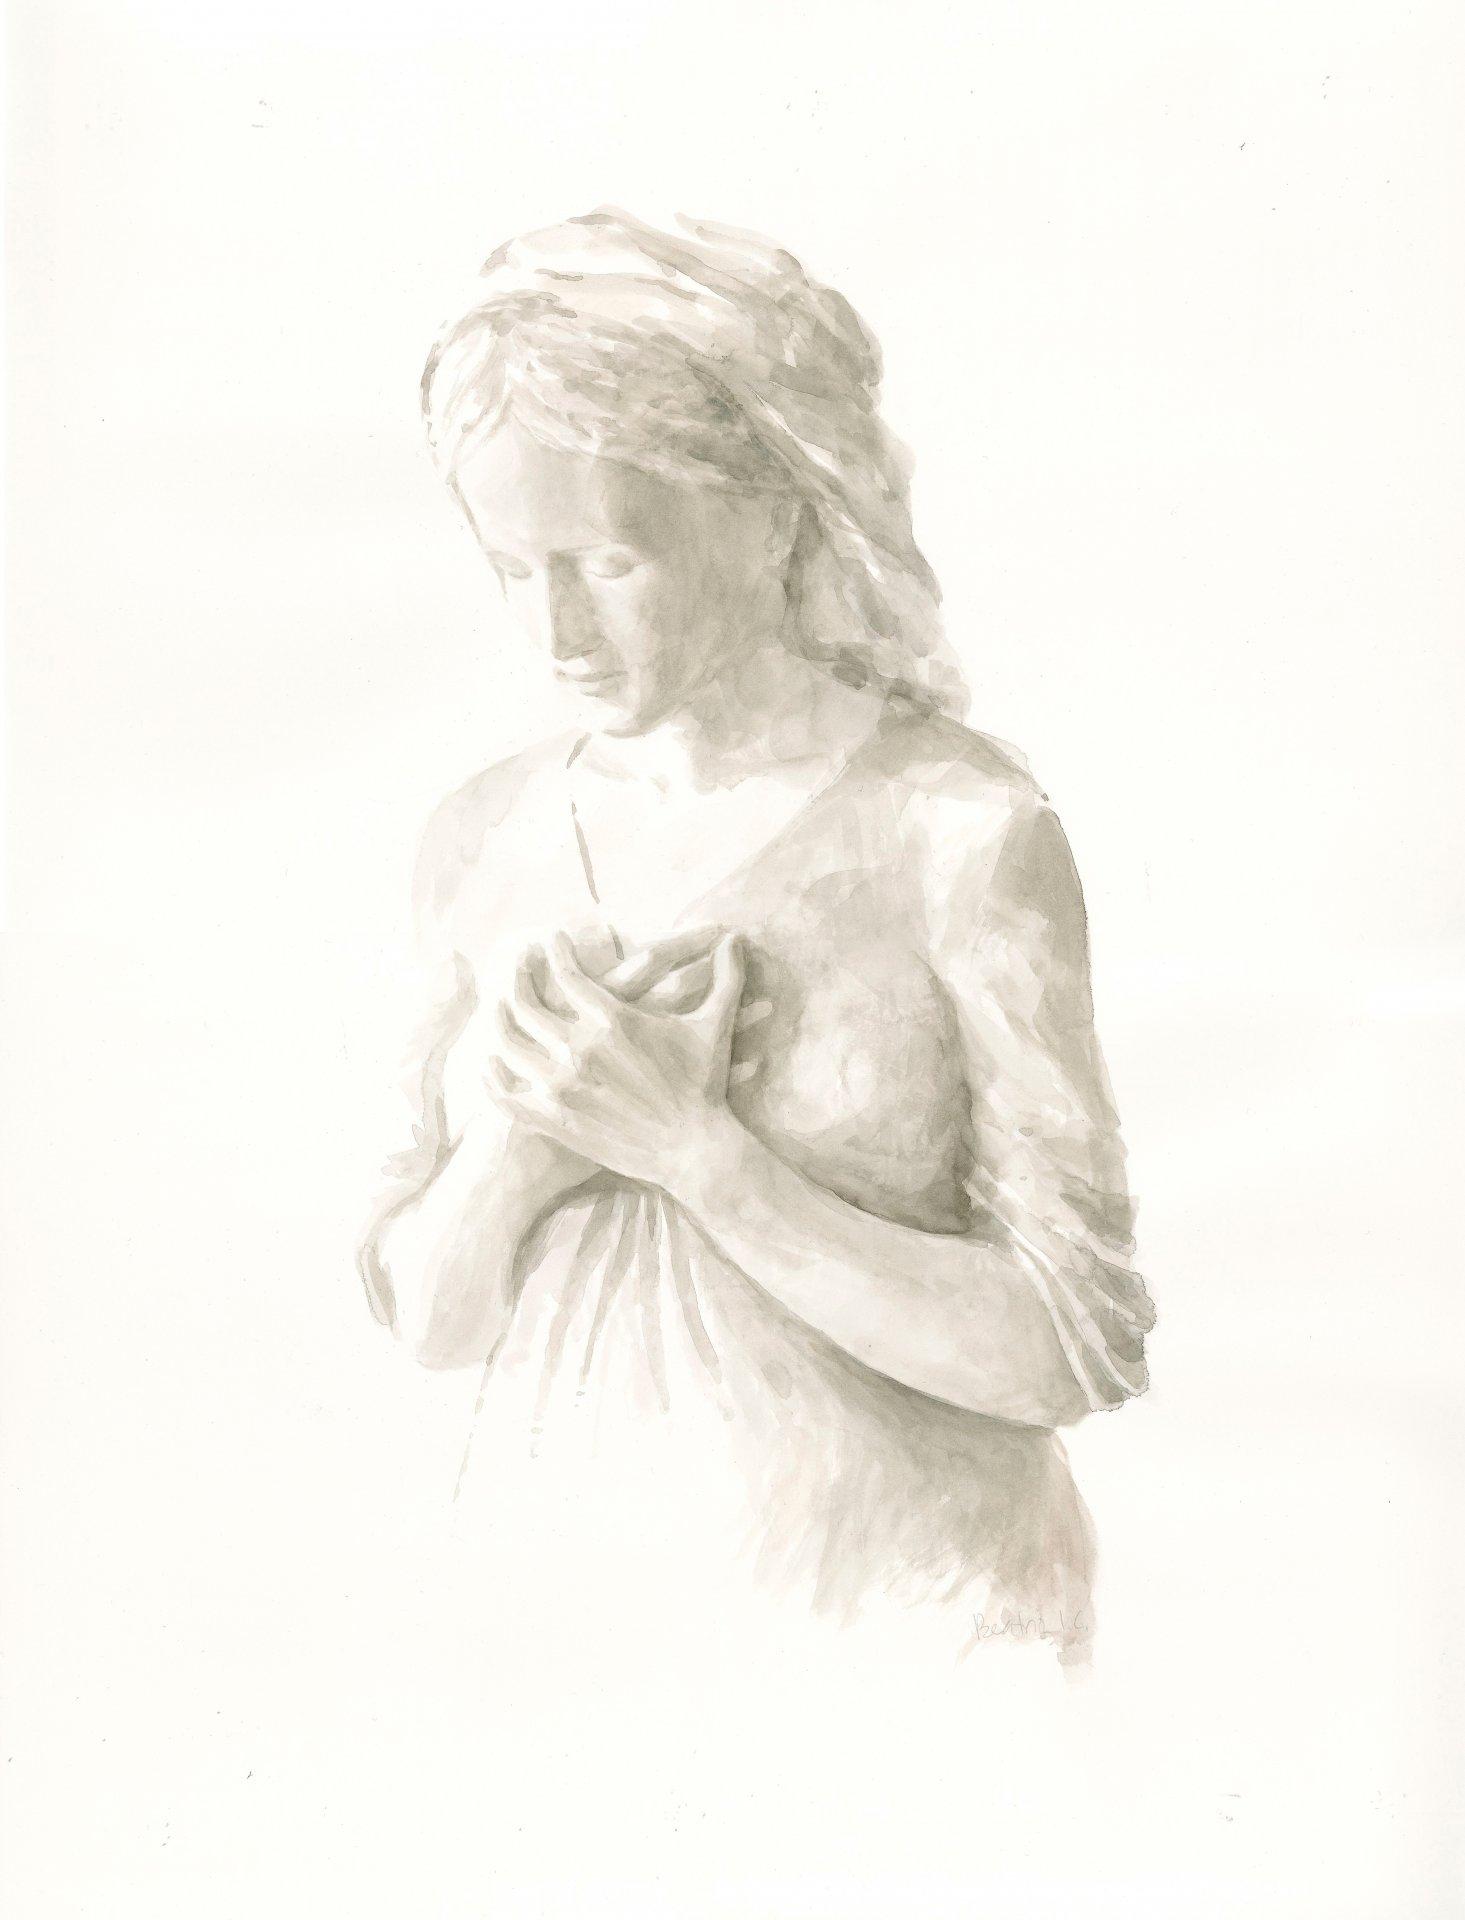 191. Bella pastora 4 (3).jpg